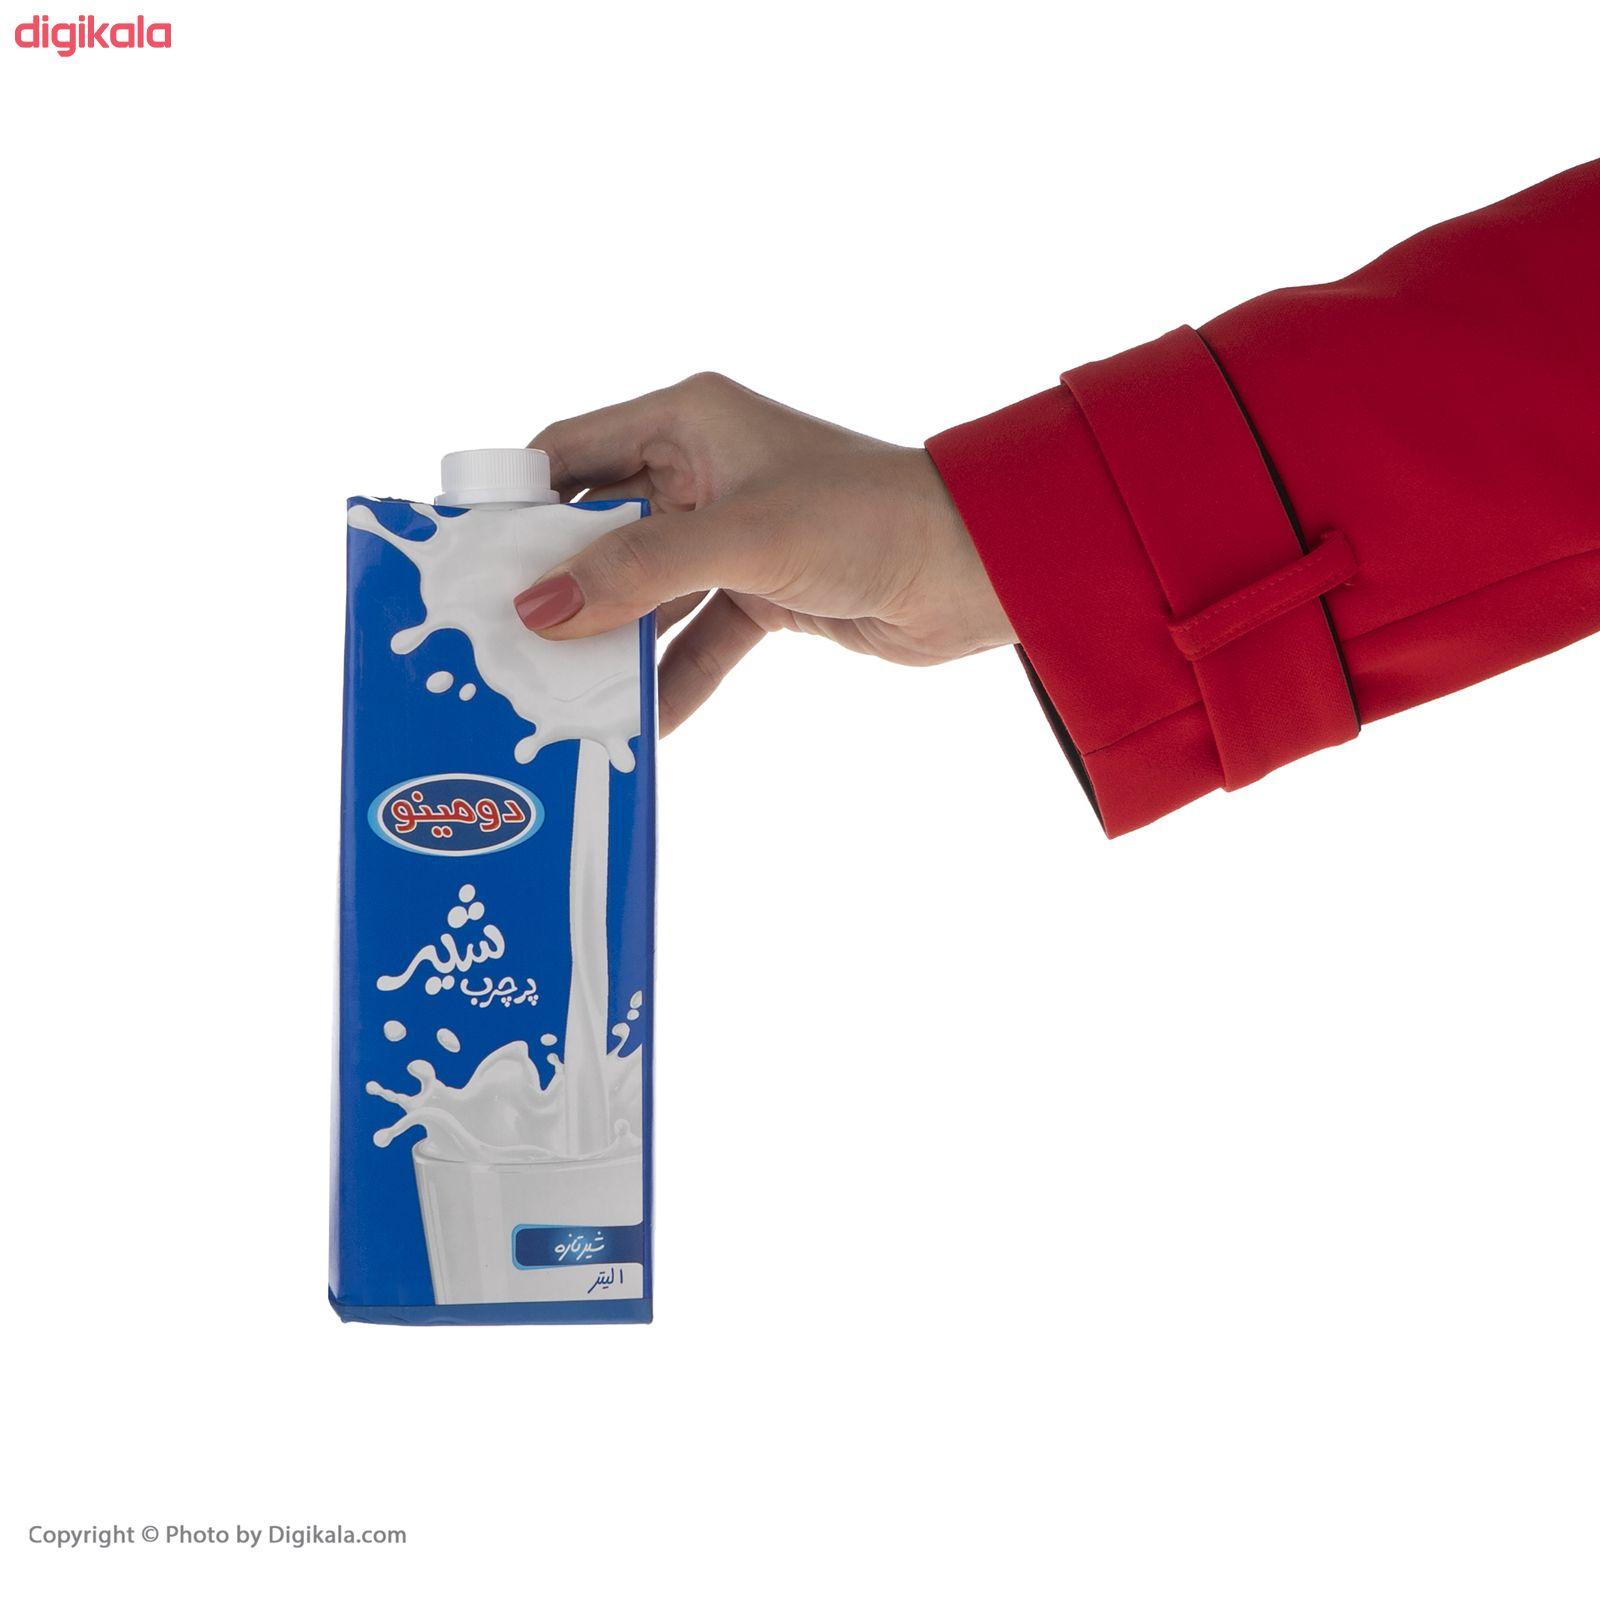 شیر پرچرب دومینو - 1 لیتر بسته 4 عددی main 1 4